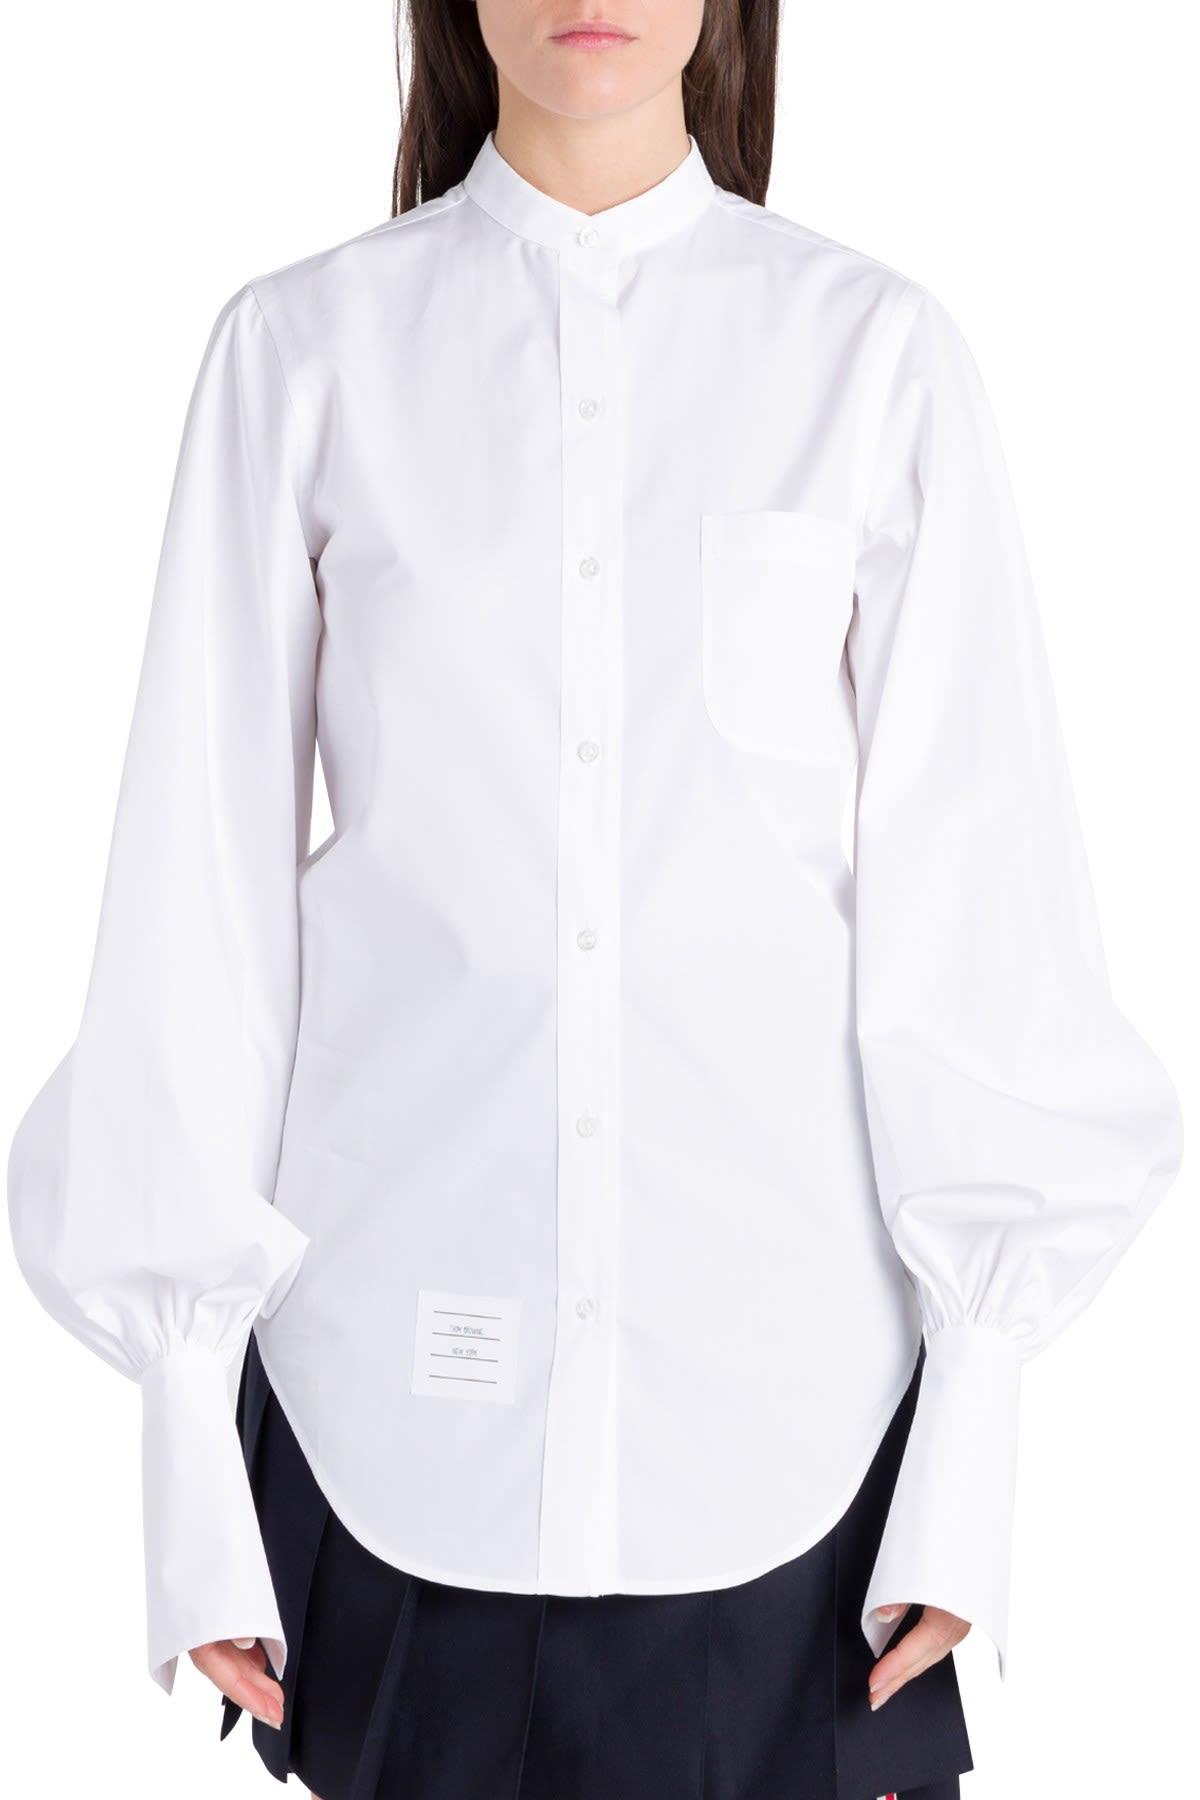 Thom Browne Gathered Sleeve Shirt